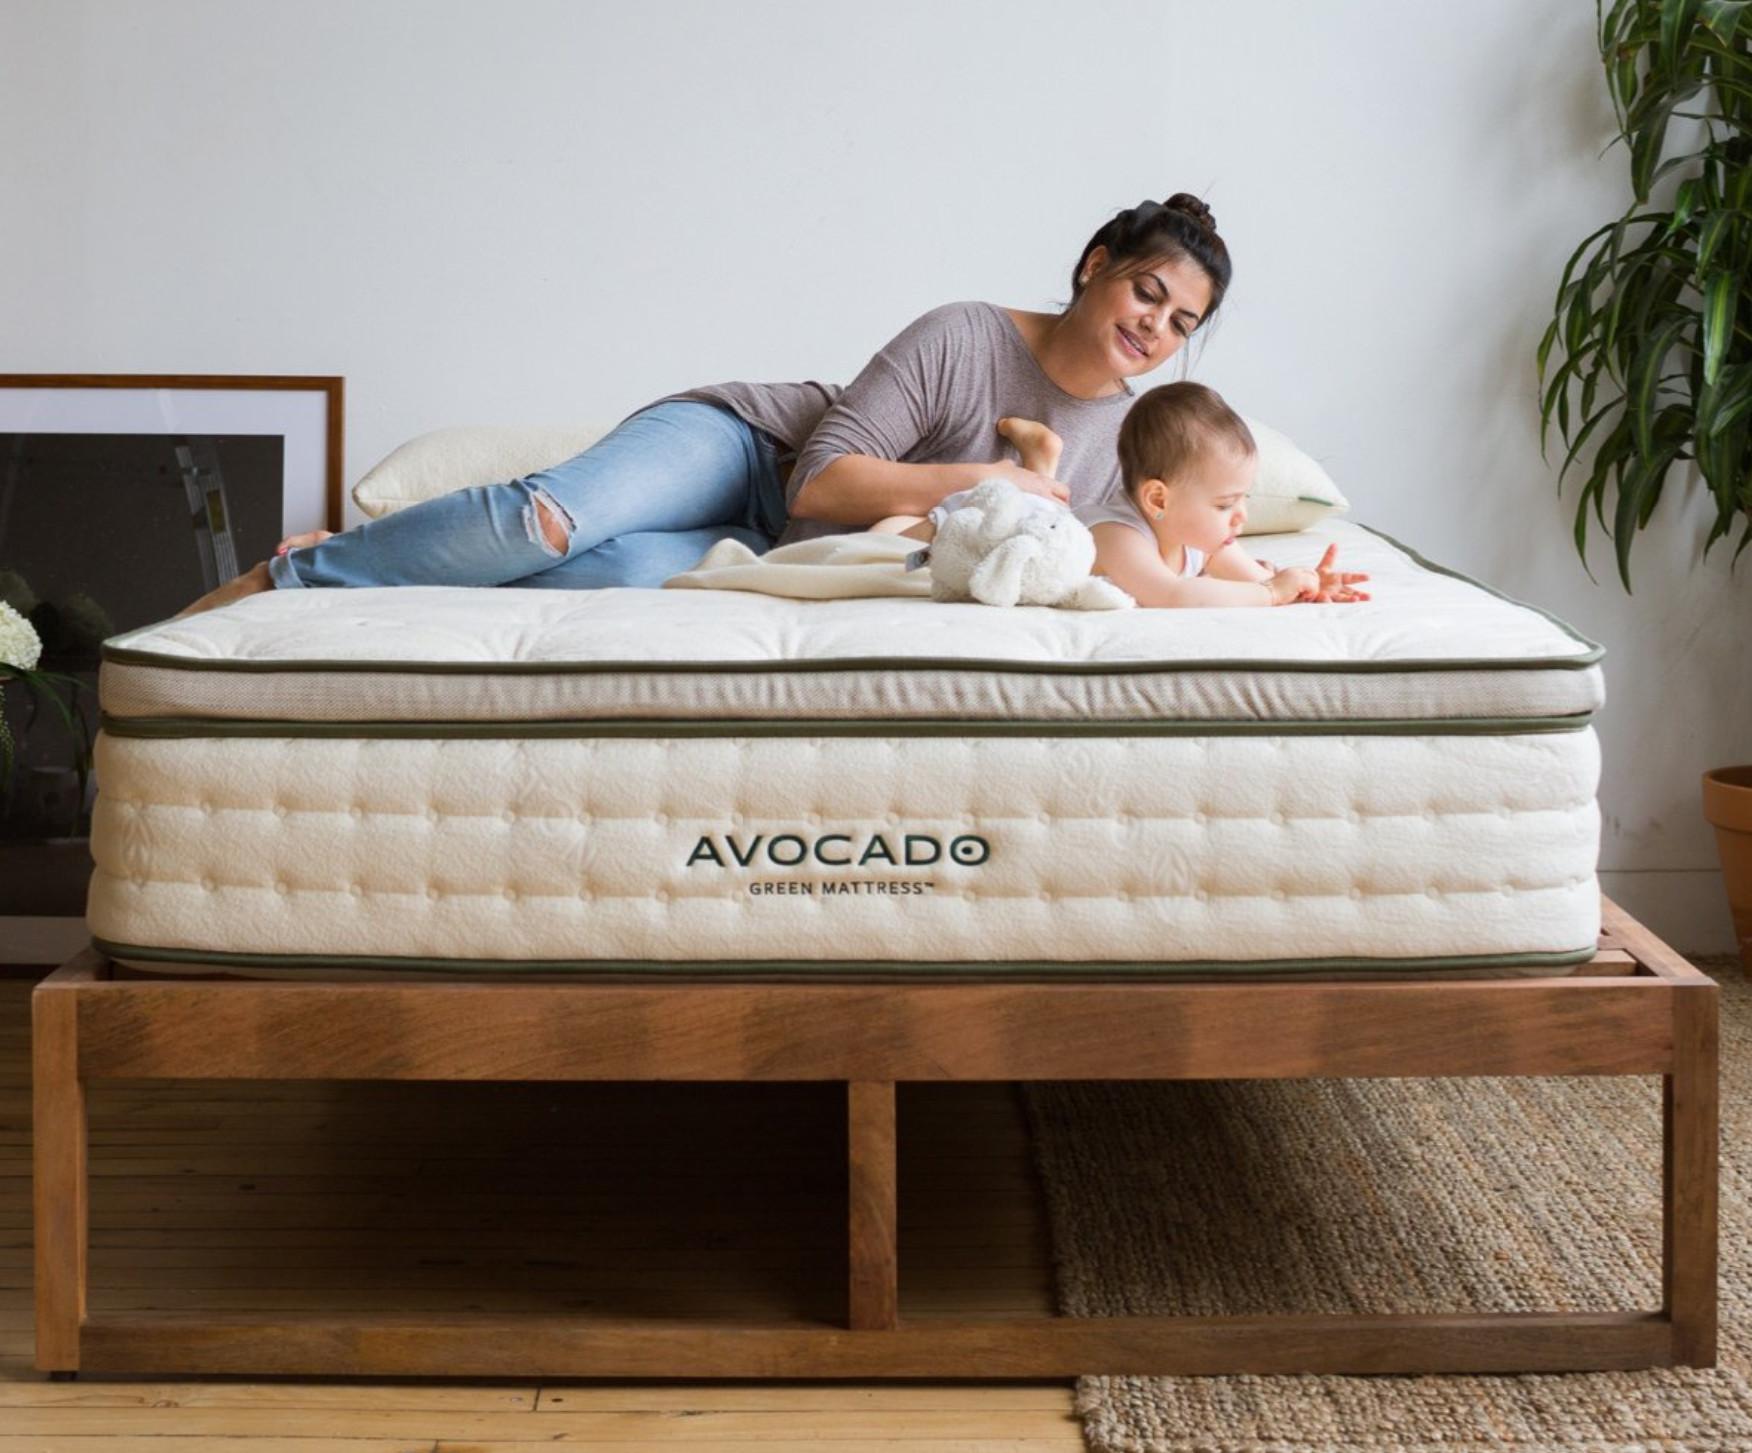 avocado mattress columbus day sale